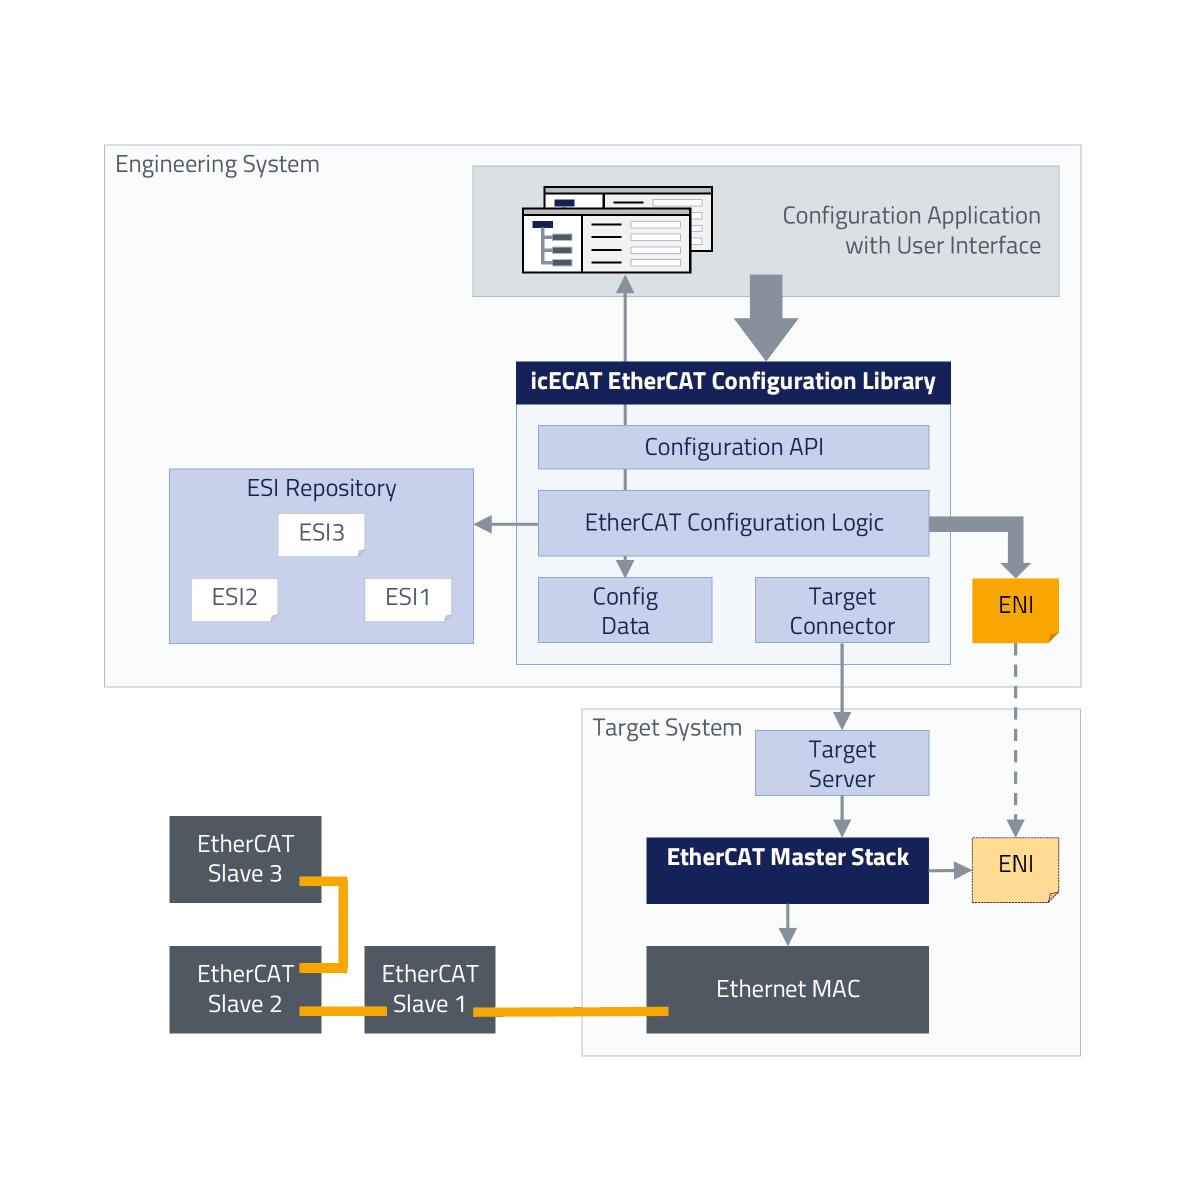 icECAT Configuration Library - Softwarearchitektur